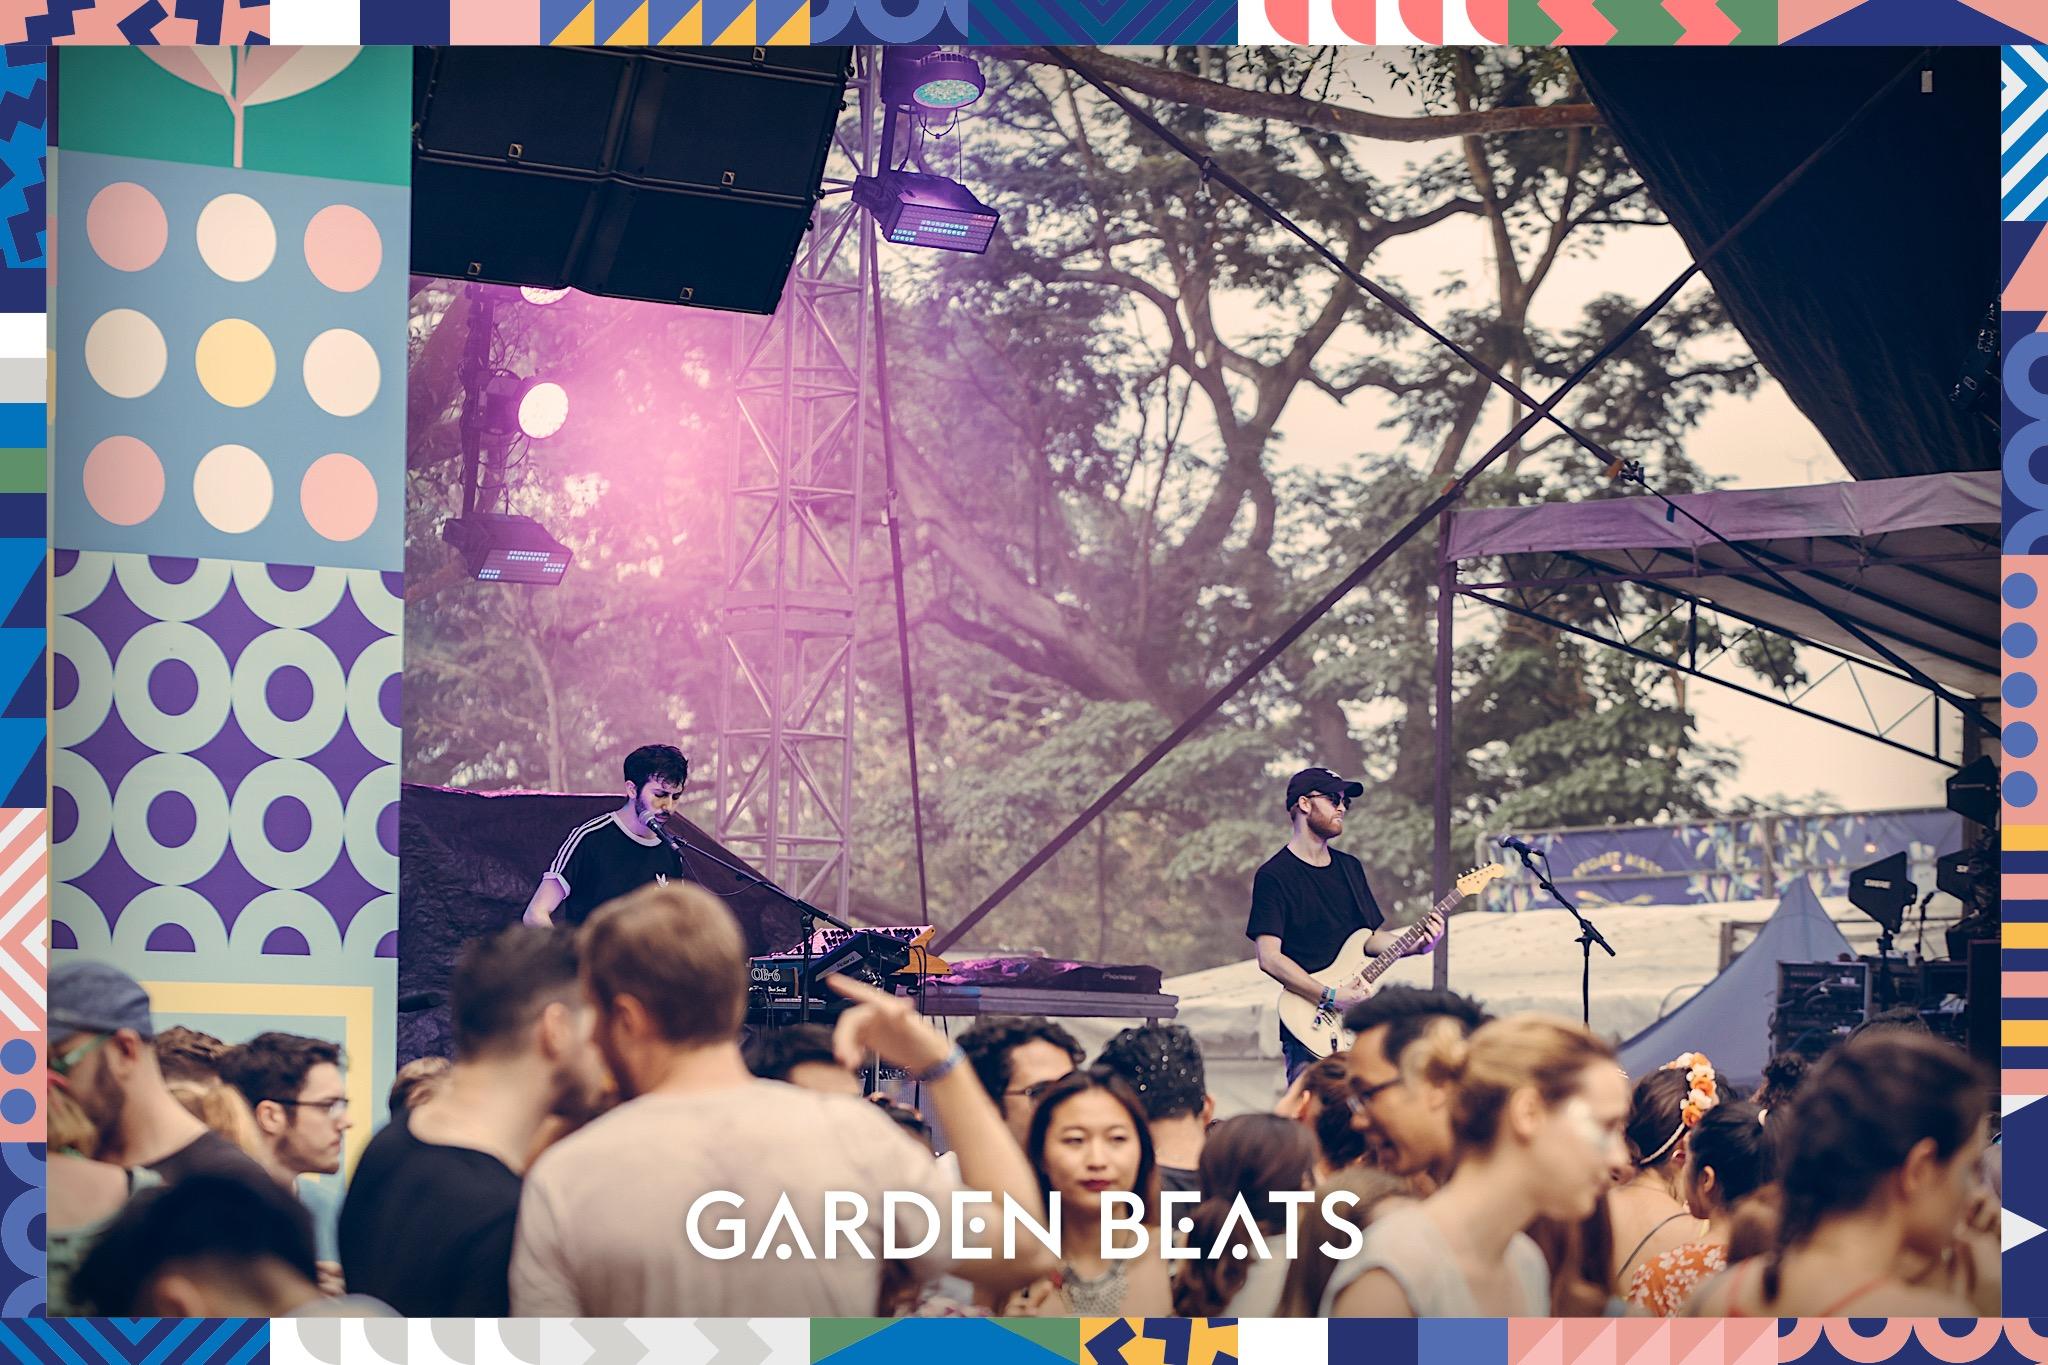 03032018_GardenBeats_Colossal605_Watermarked.jpg